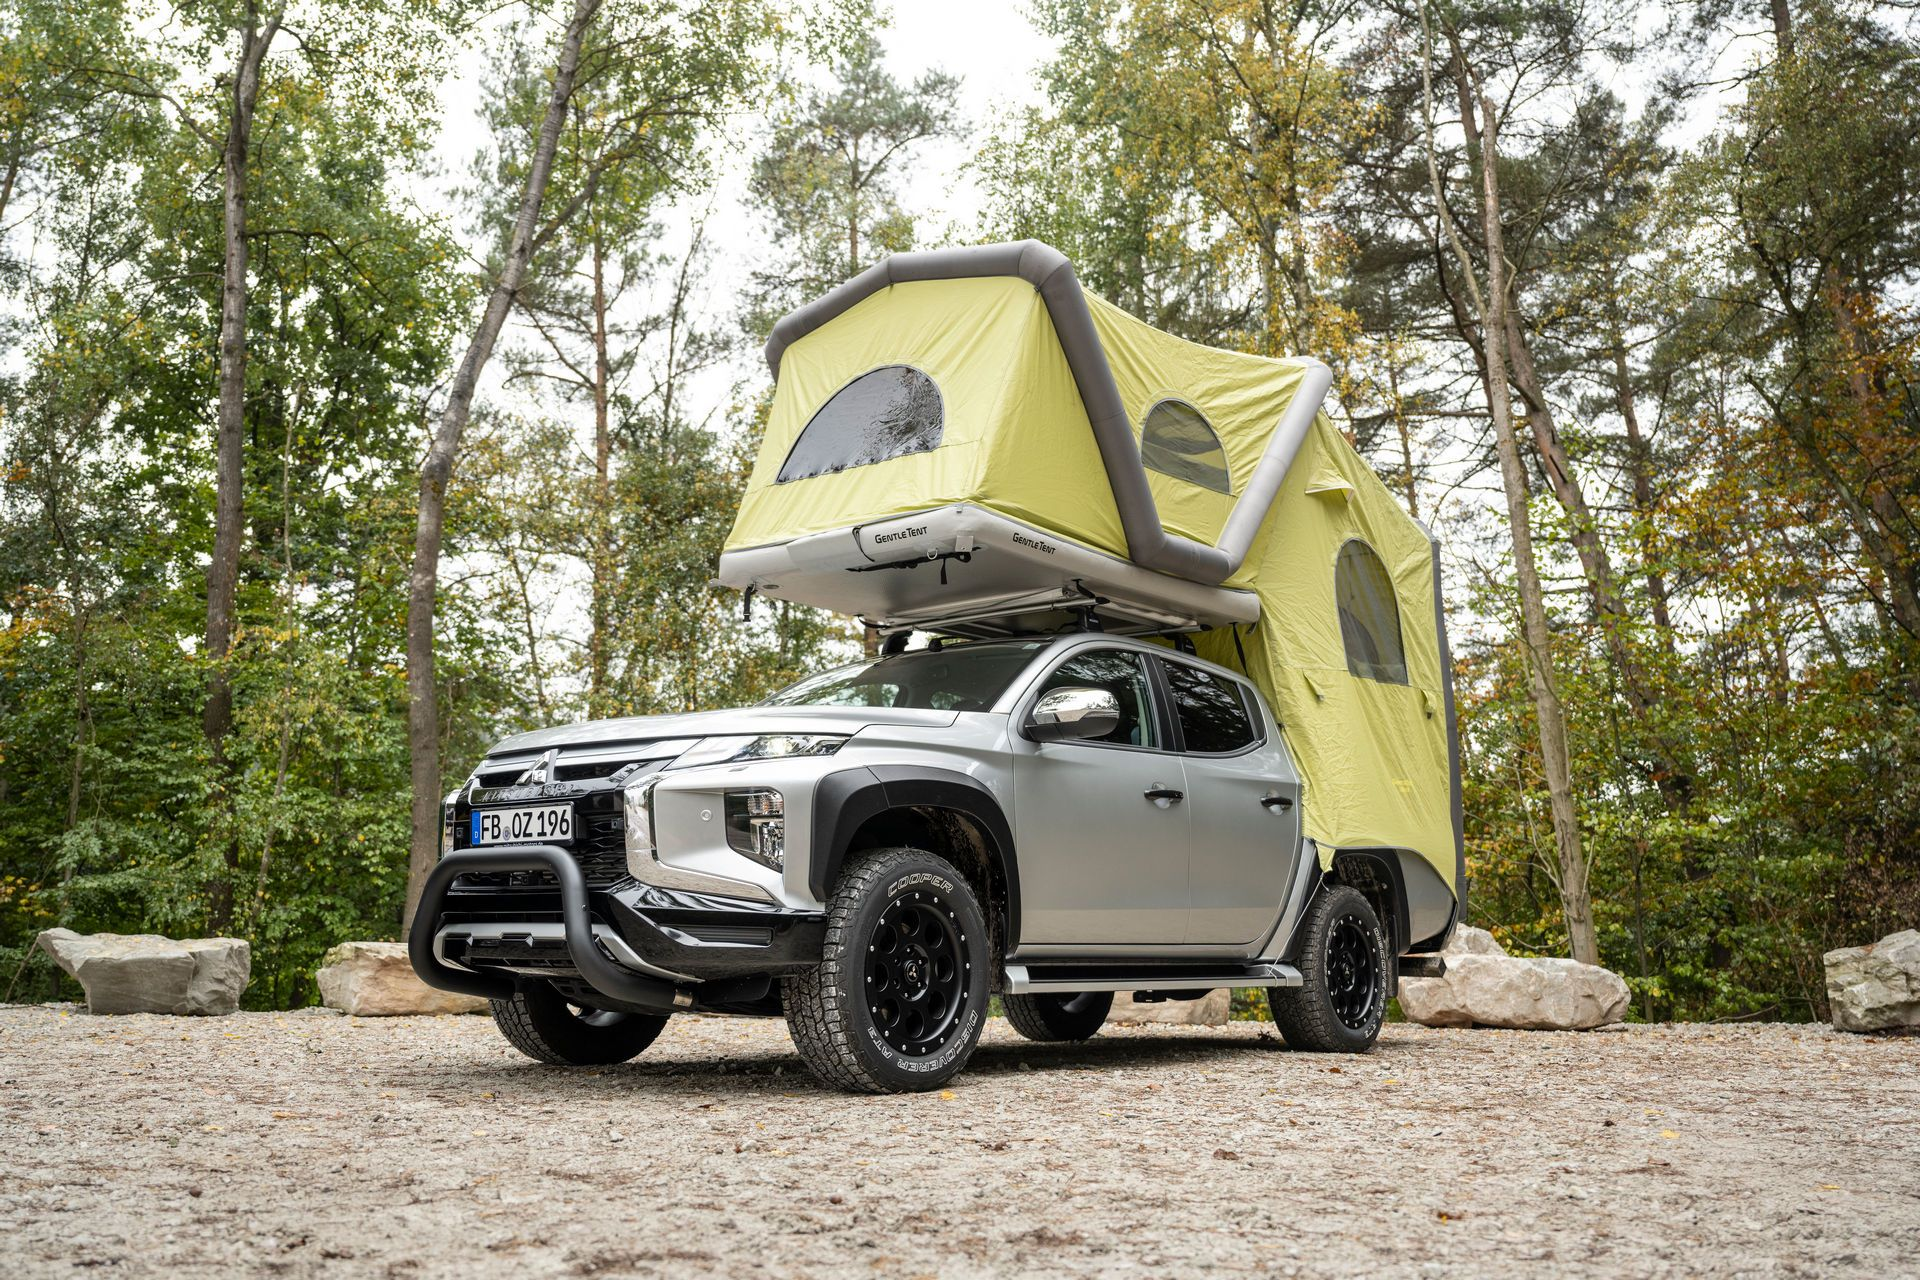 Mitsubishi-L200-Camping-Accessories-8